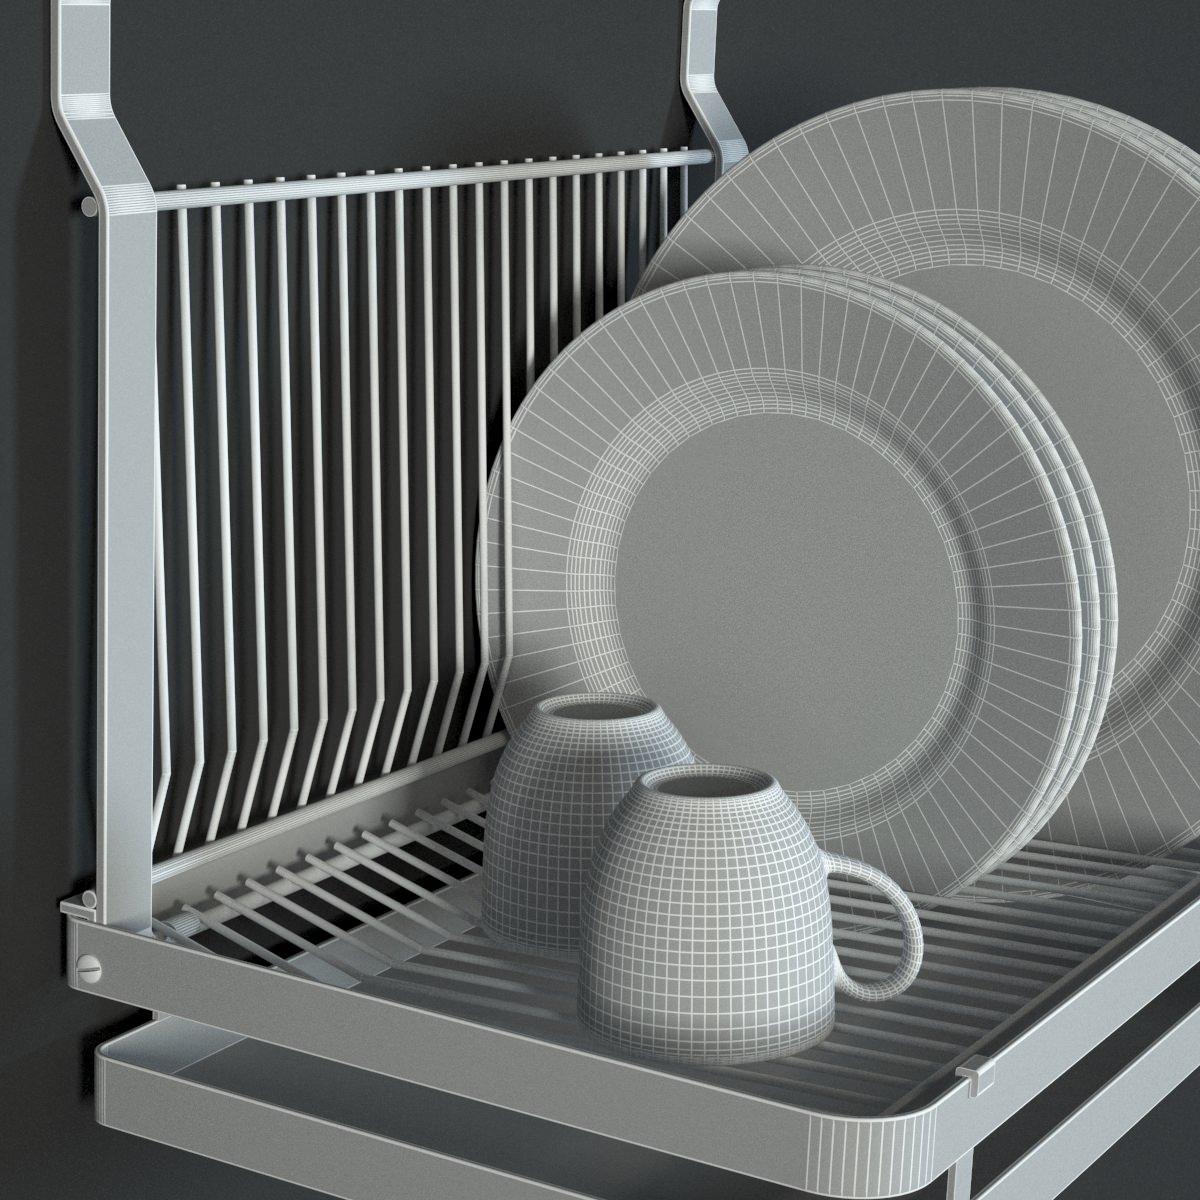 Ikea Variera Door Mounted Storage ~ ikea grundtal dish drainer 3D Models  CGTrader com